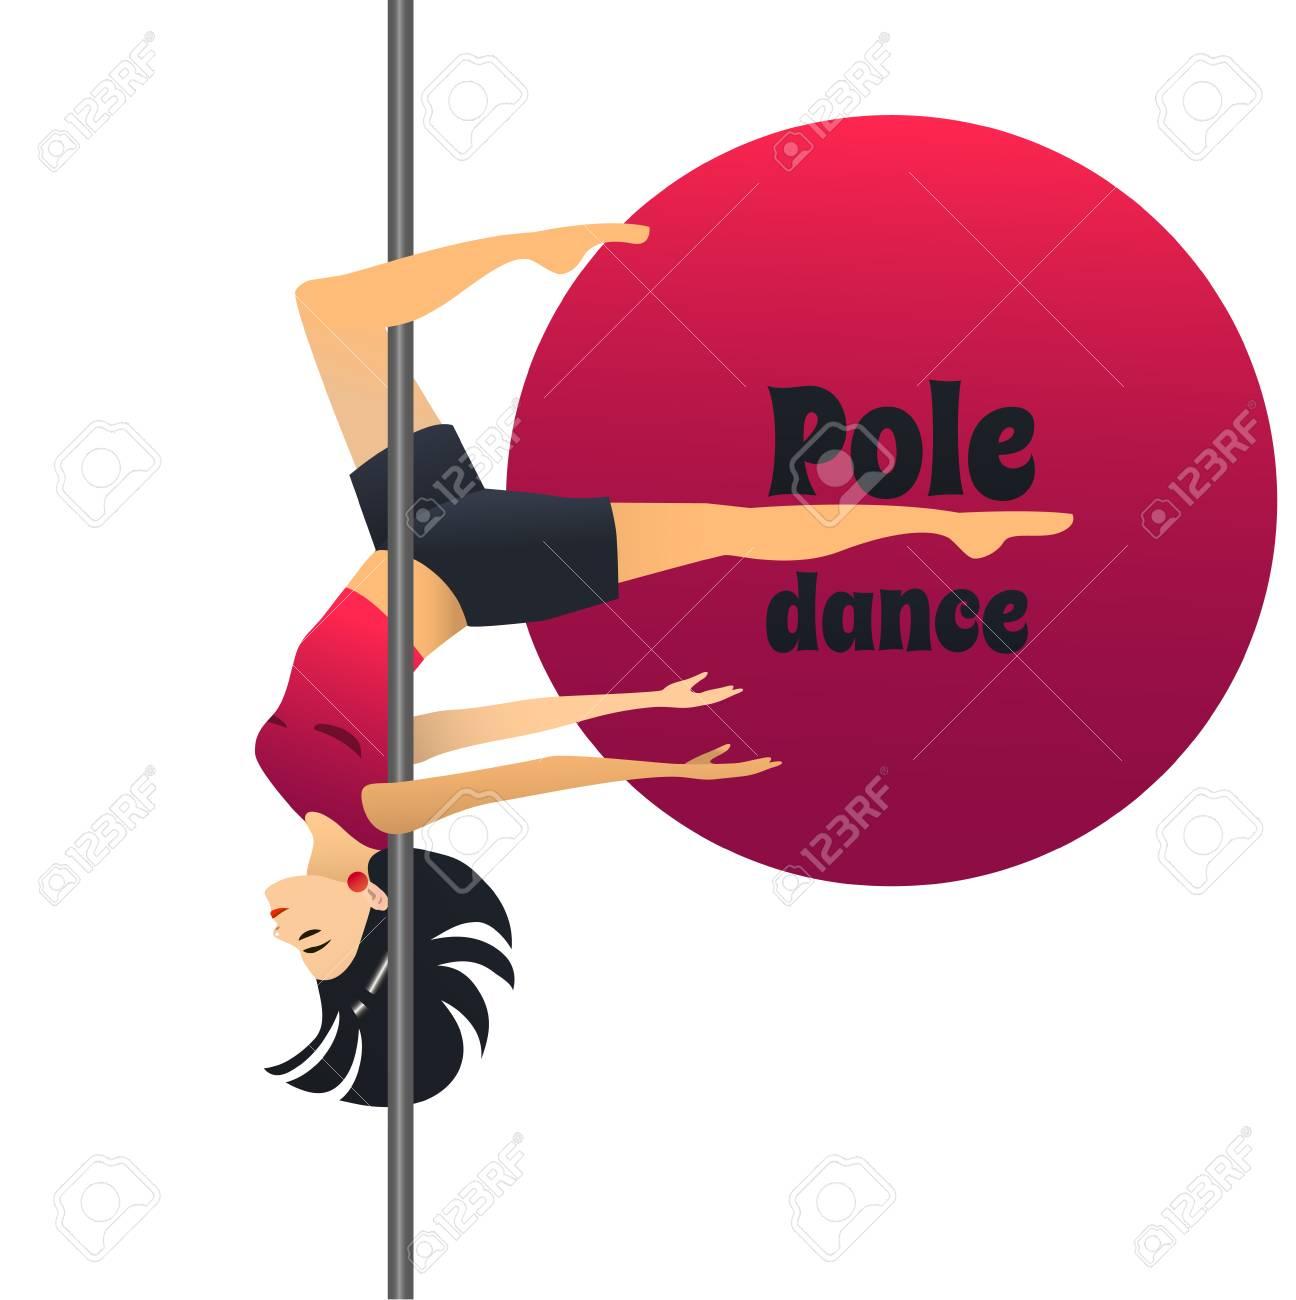 Pole Dancer Dancing Girl In Cartoon Style For Fliers Posters Banners Prints Of Dance School